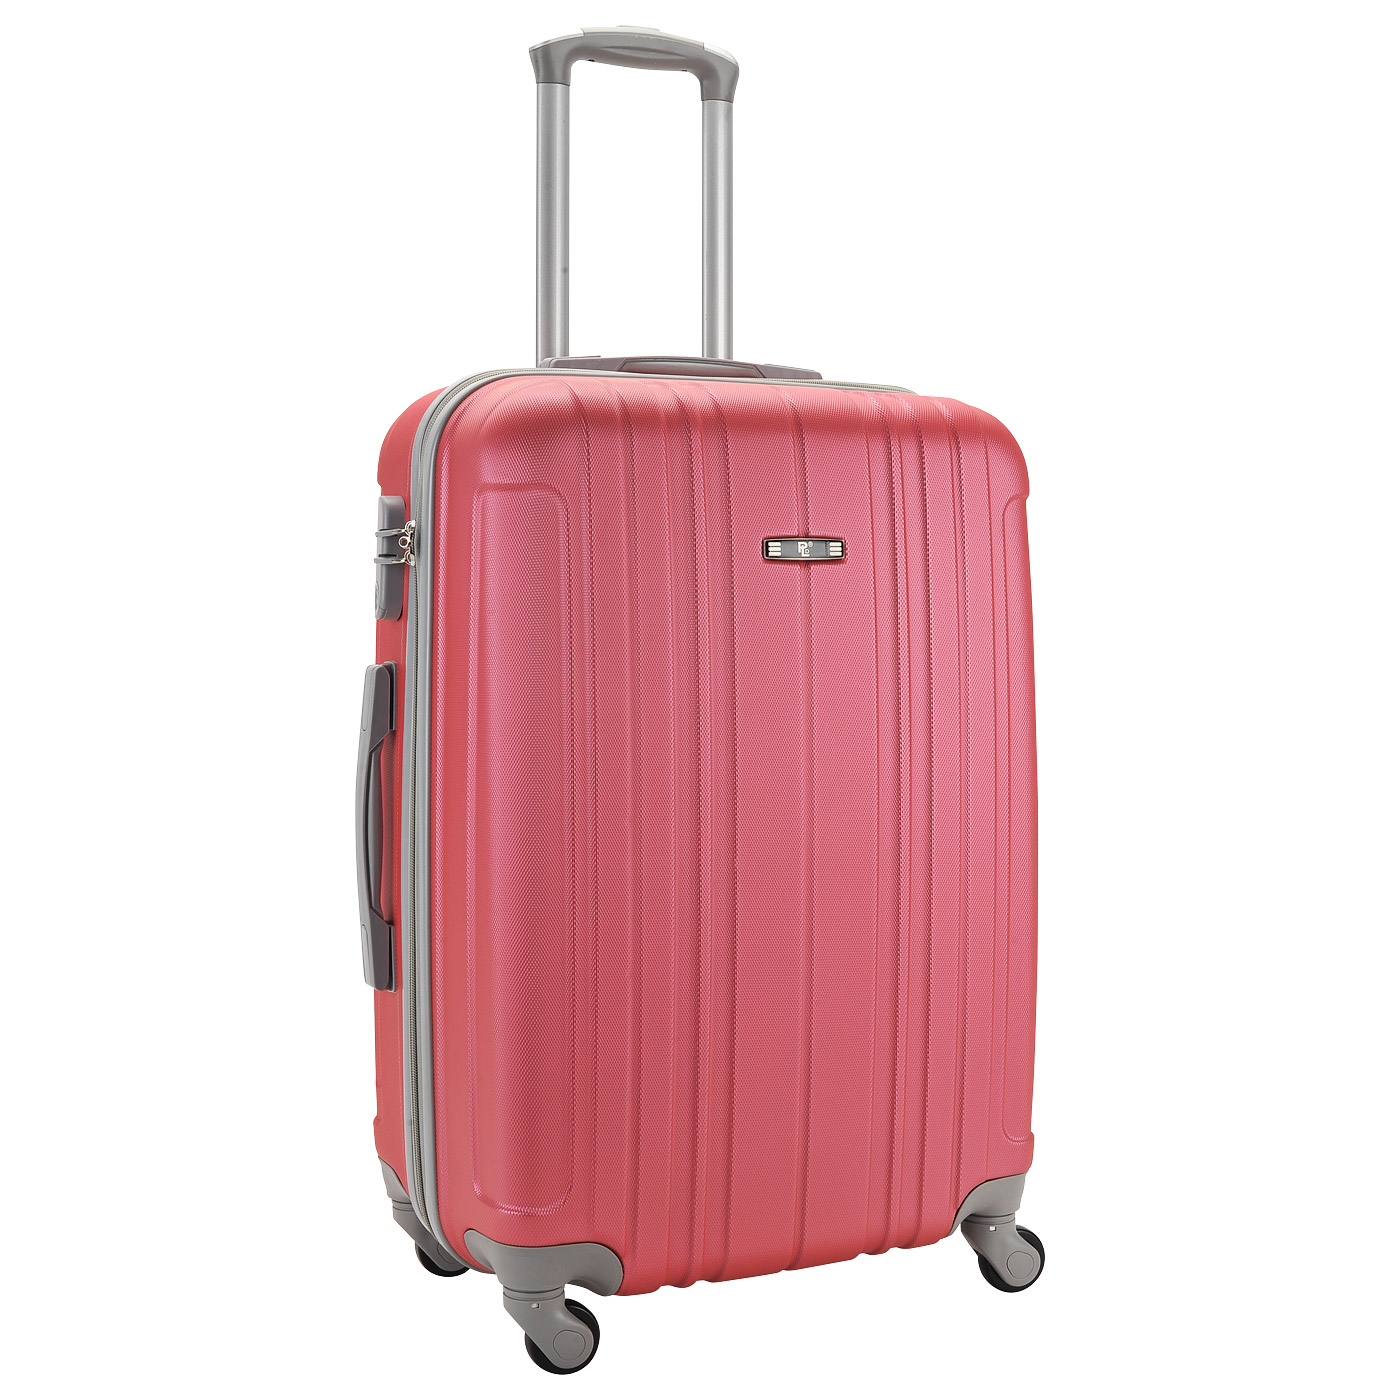 Чемодан на колесах MyxBag MXB-pink-M-i - 2000557764569 розовый ABS ... a90663c7bfe